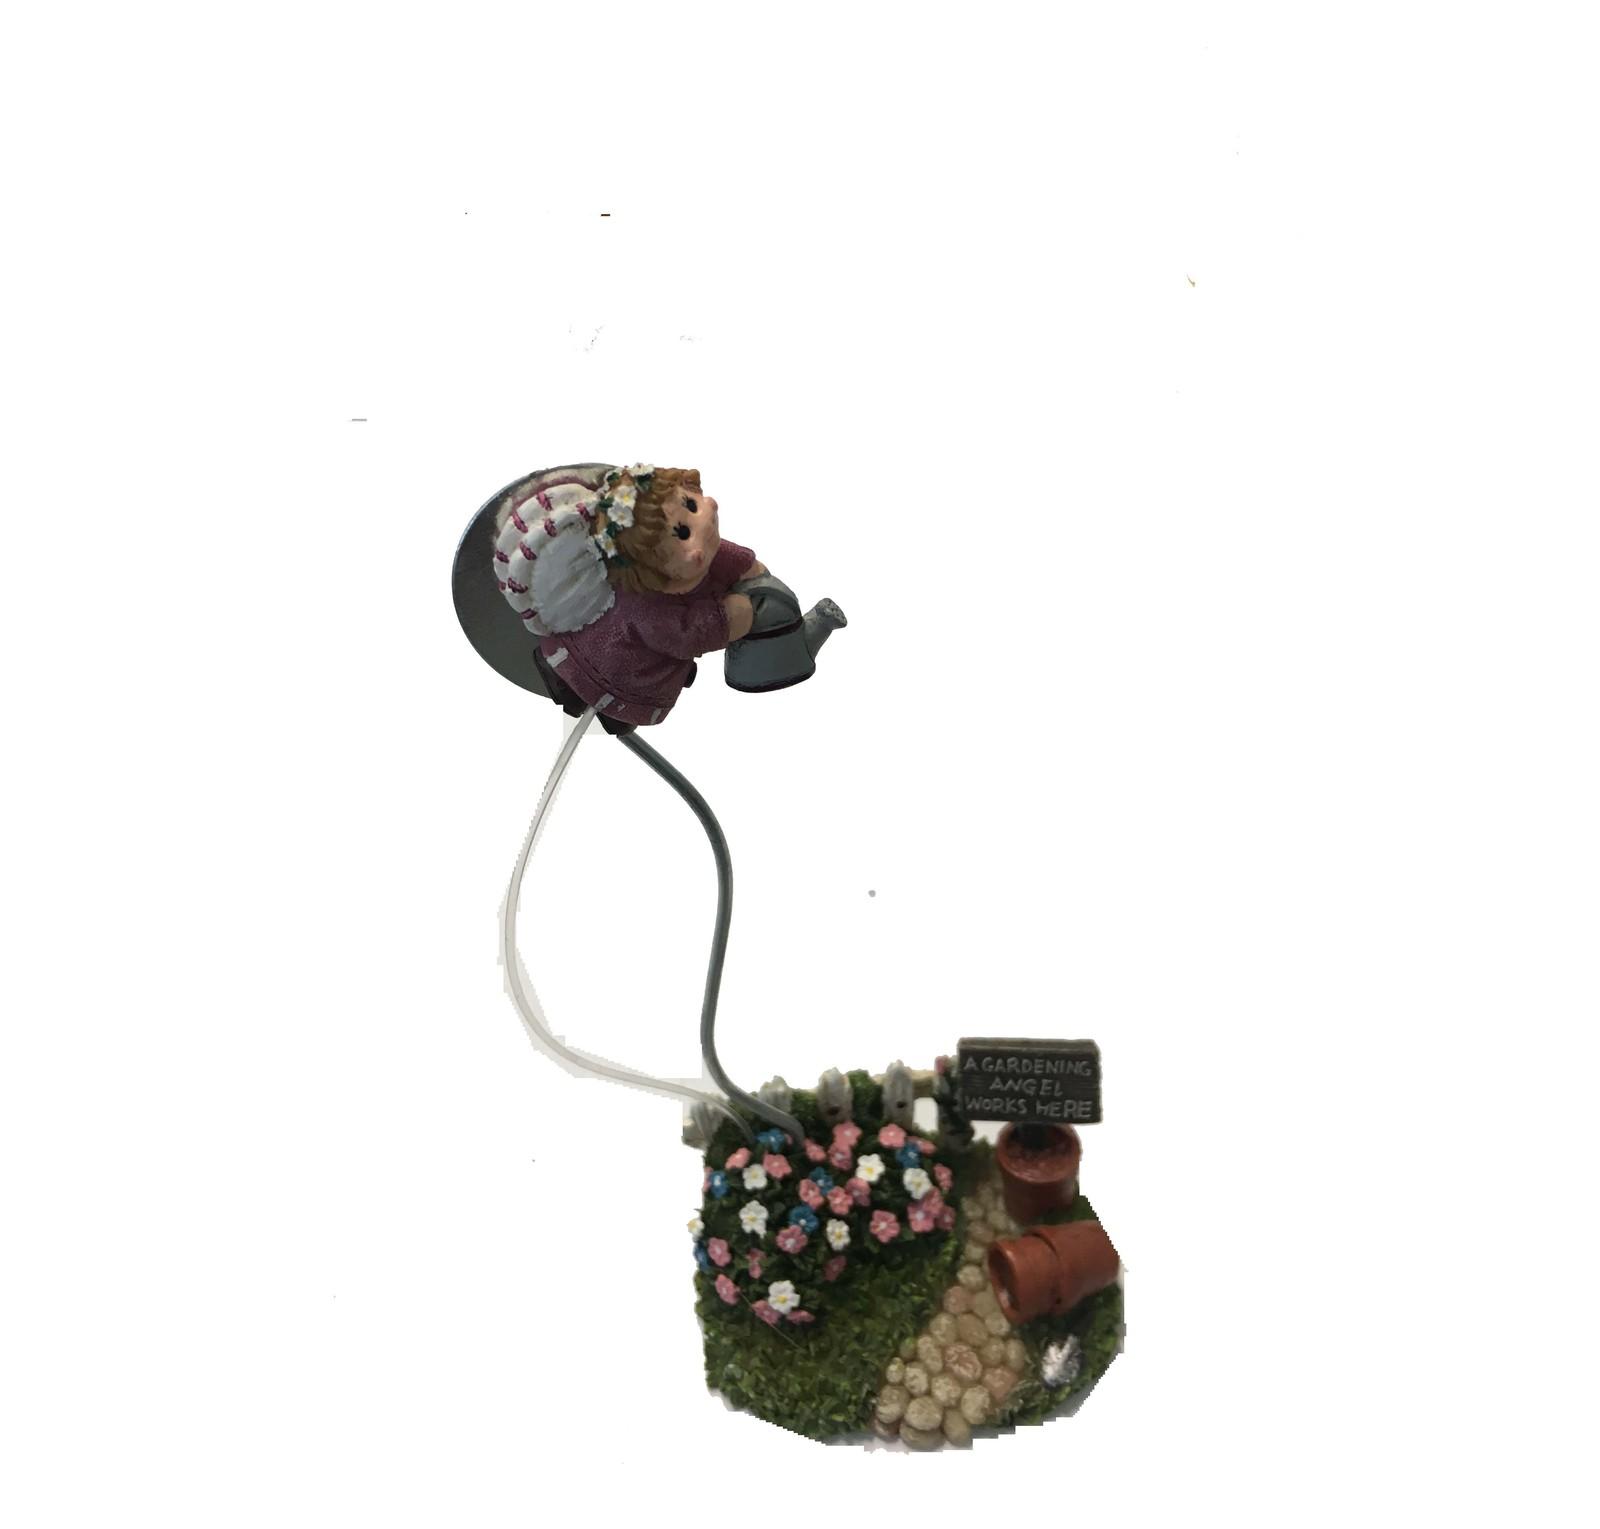 A gardening angel wirks here ceramic ornament